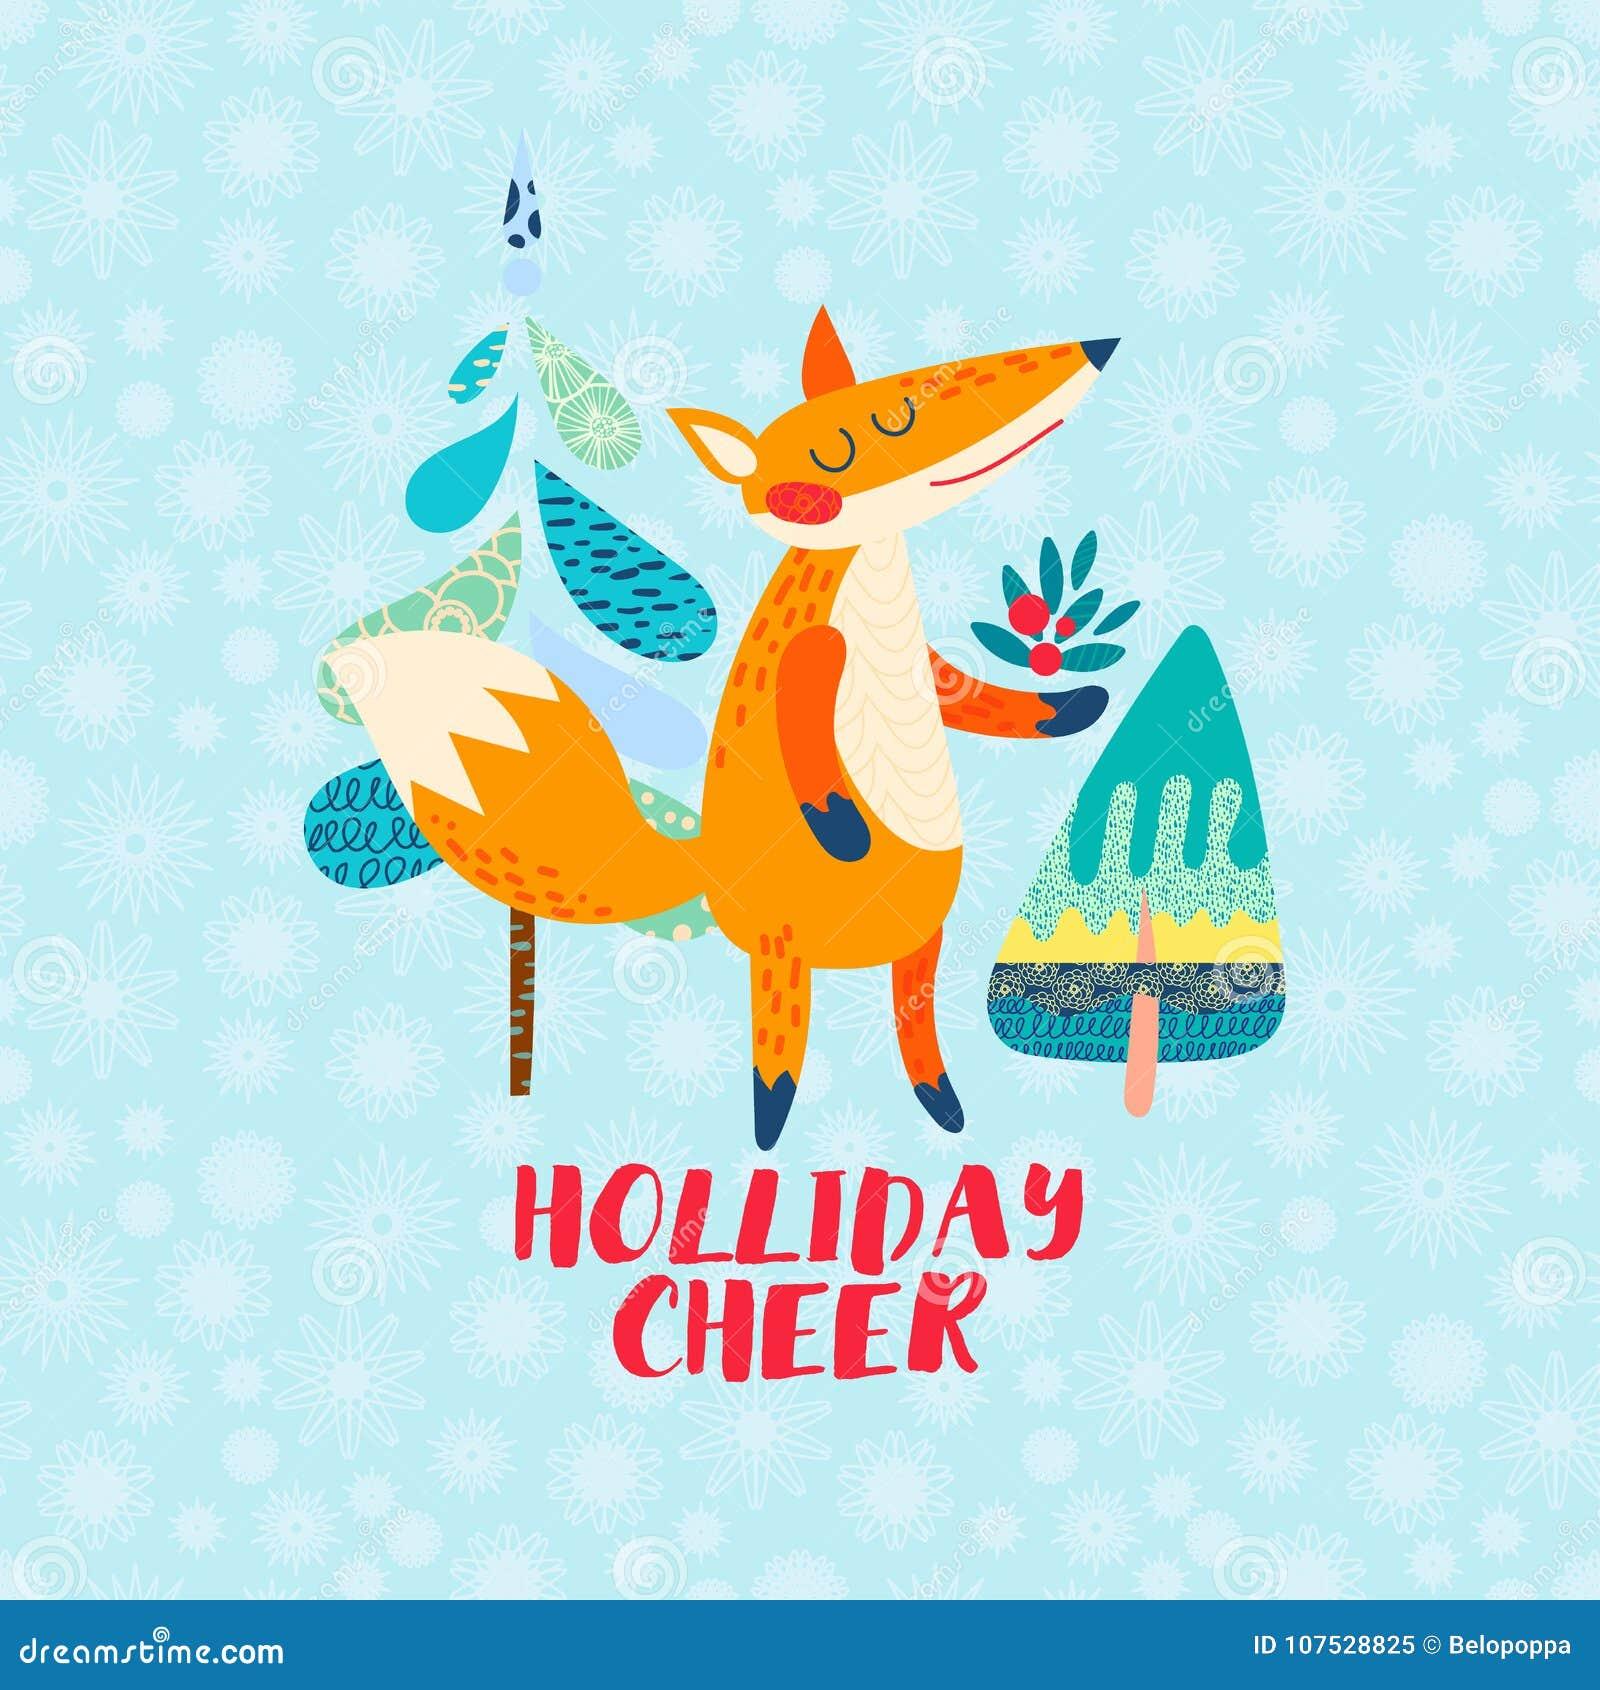 Holliday Cheer Cartoon Red Fox Greeting Card Stock Vector